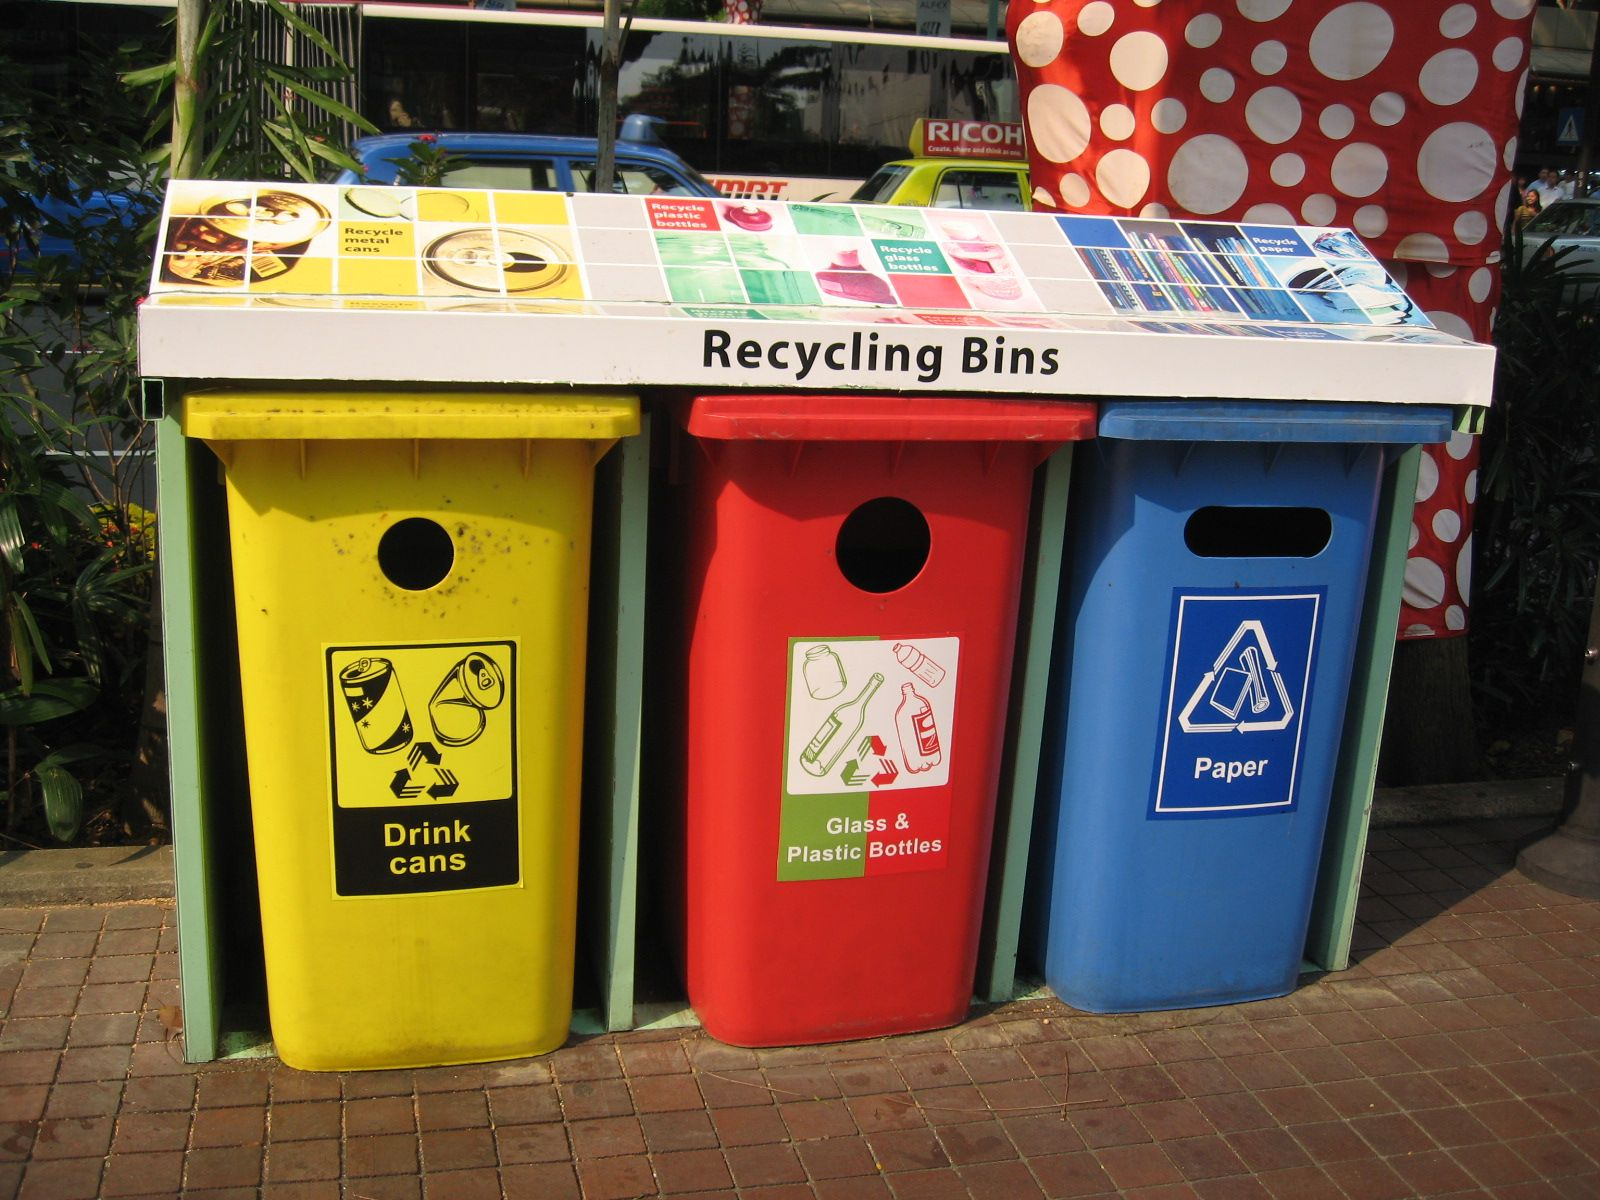 Ufficio Zen Wikipedia : Nea recycling bins orchard road waste sorting wikipedia the